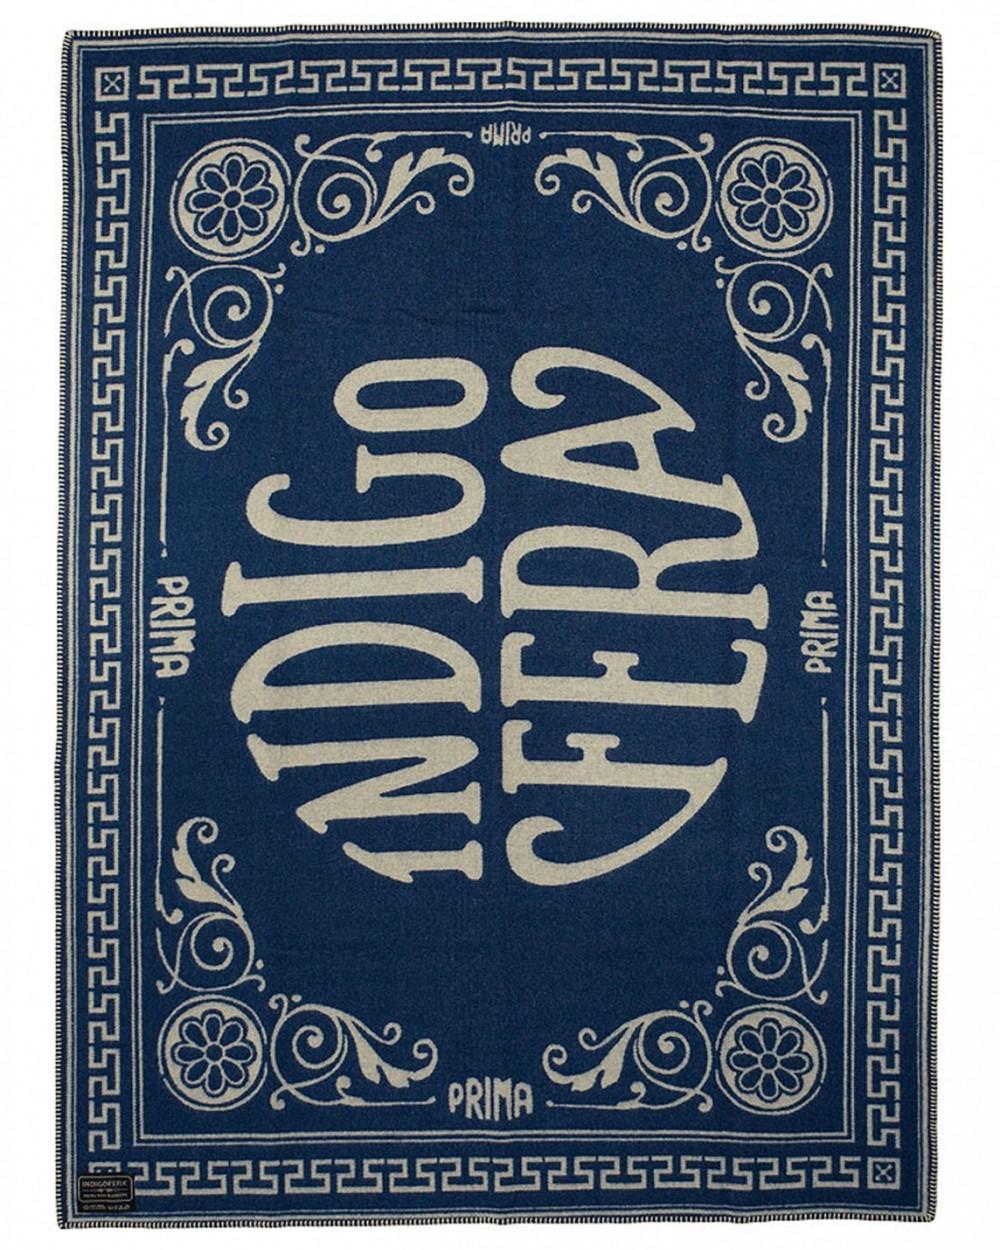 """Indigofera-Jeans-Logo-Blanket-Blue-1144x1430.jpg"""